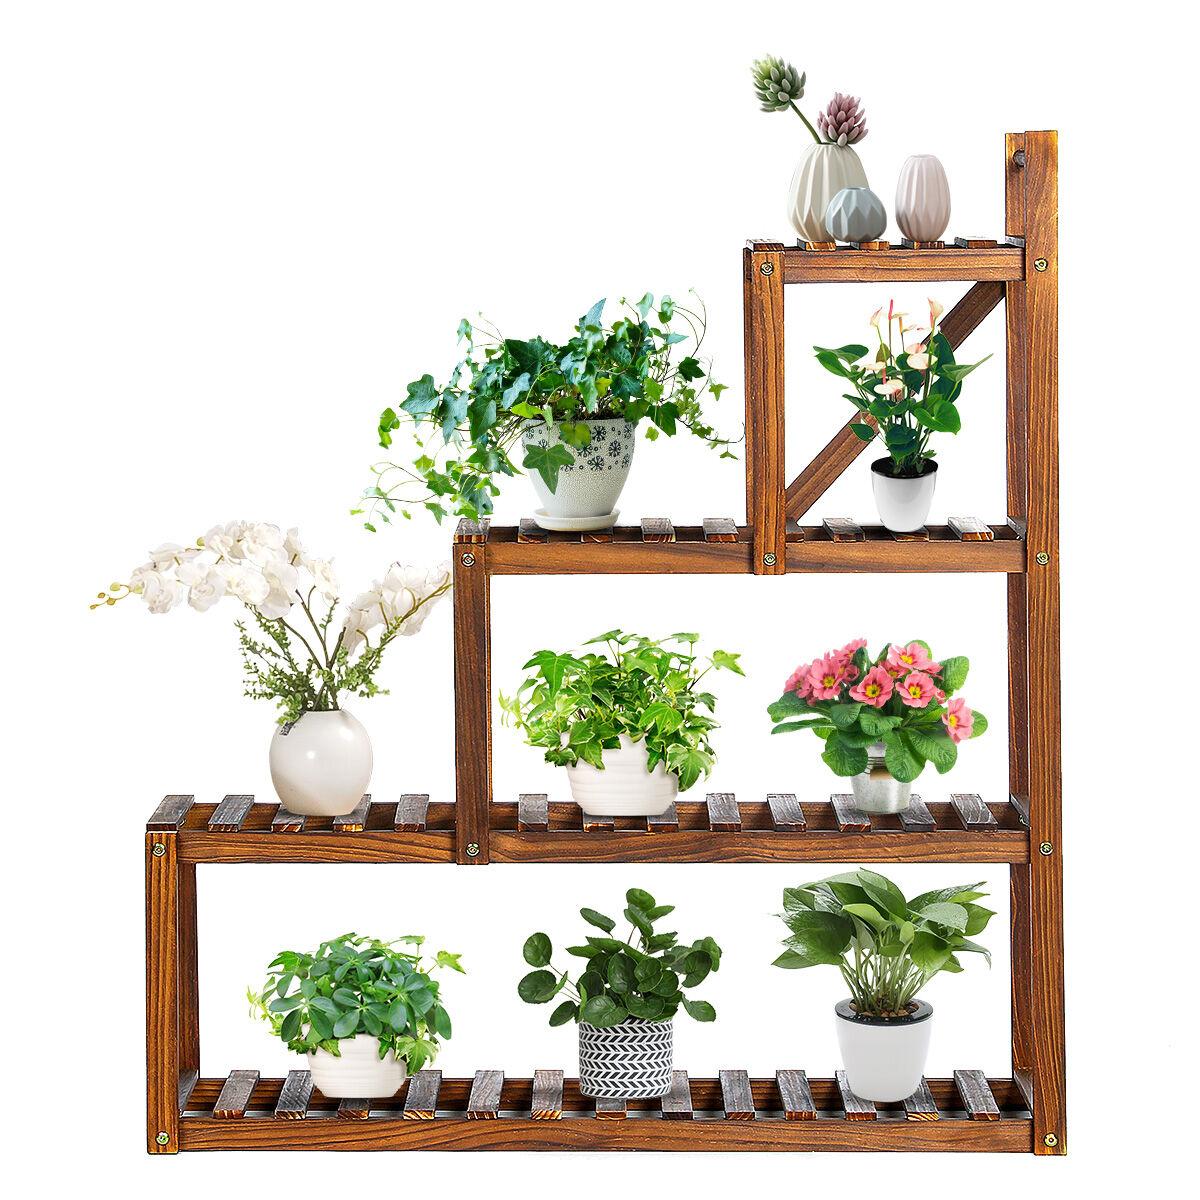 audew Wood Plant Corner Flower Pot Stand Stylish Display Rack Holder 3-Tier Steady Vertical Carbonized Shelves for Patio Living Room Balcony Garden Yard